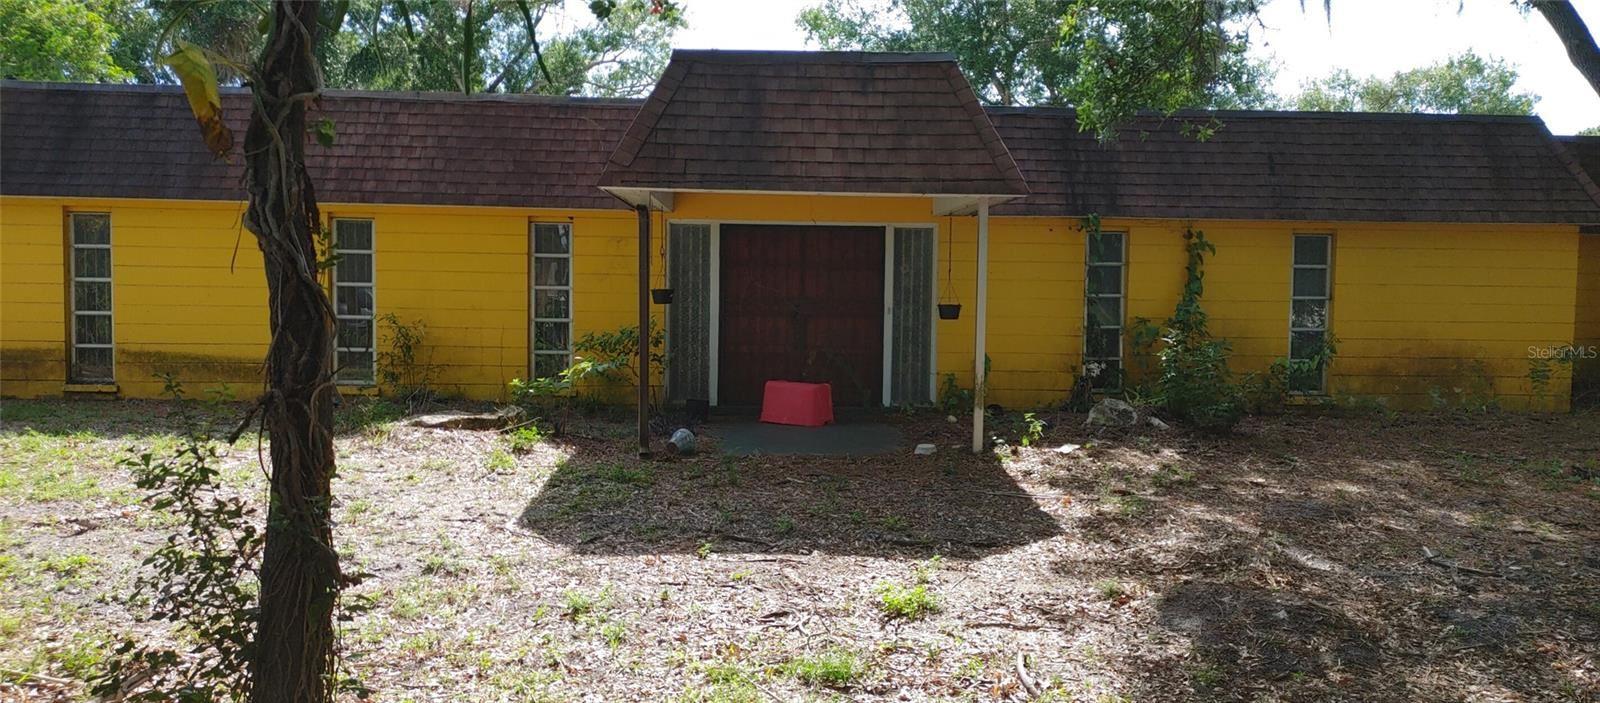 2415 N TUTTLE AVENUE, Sarasota, FL 34234 - #: A4504022